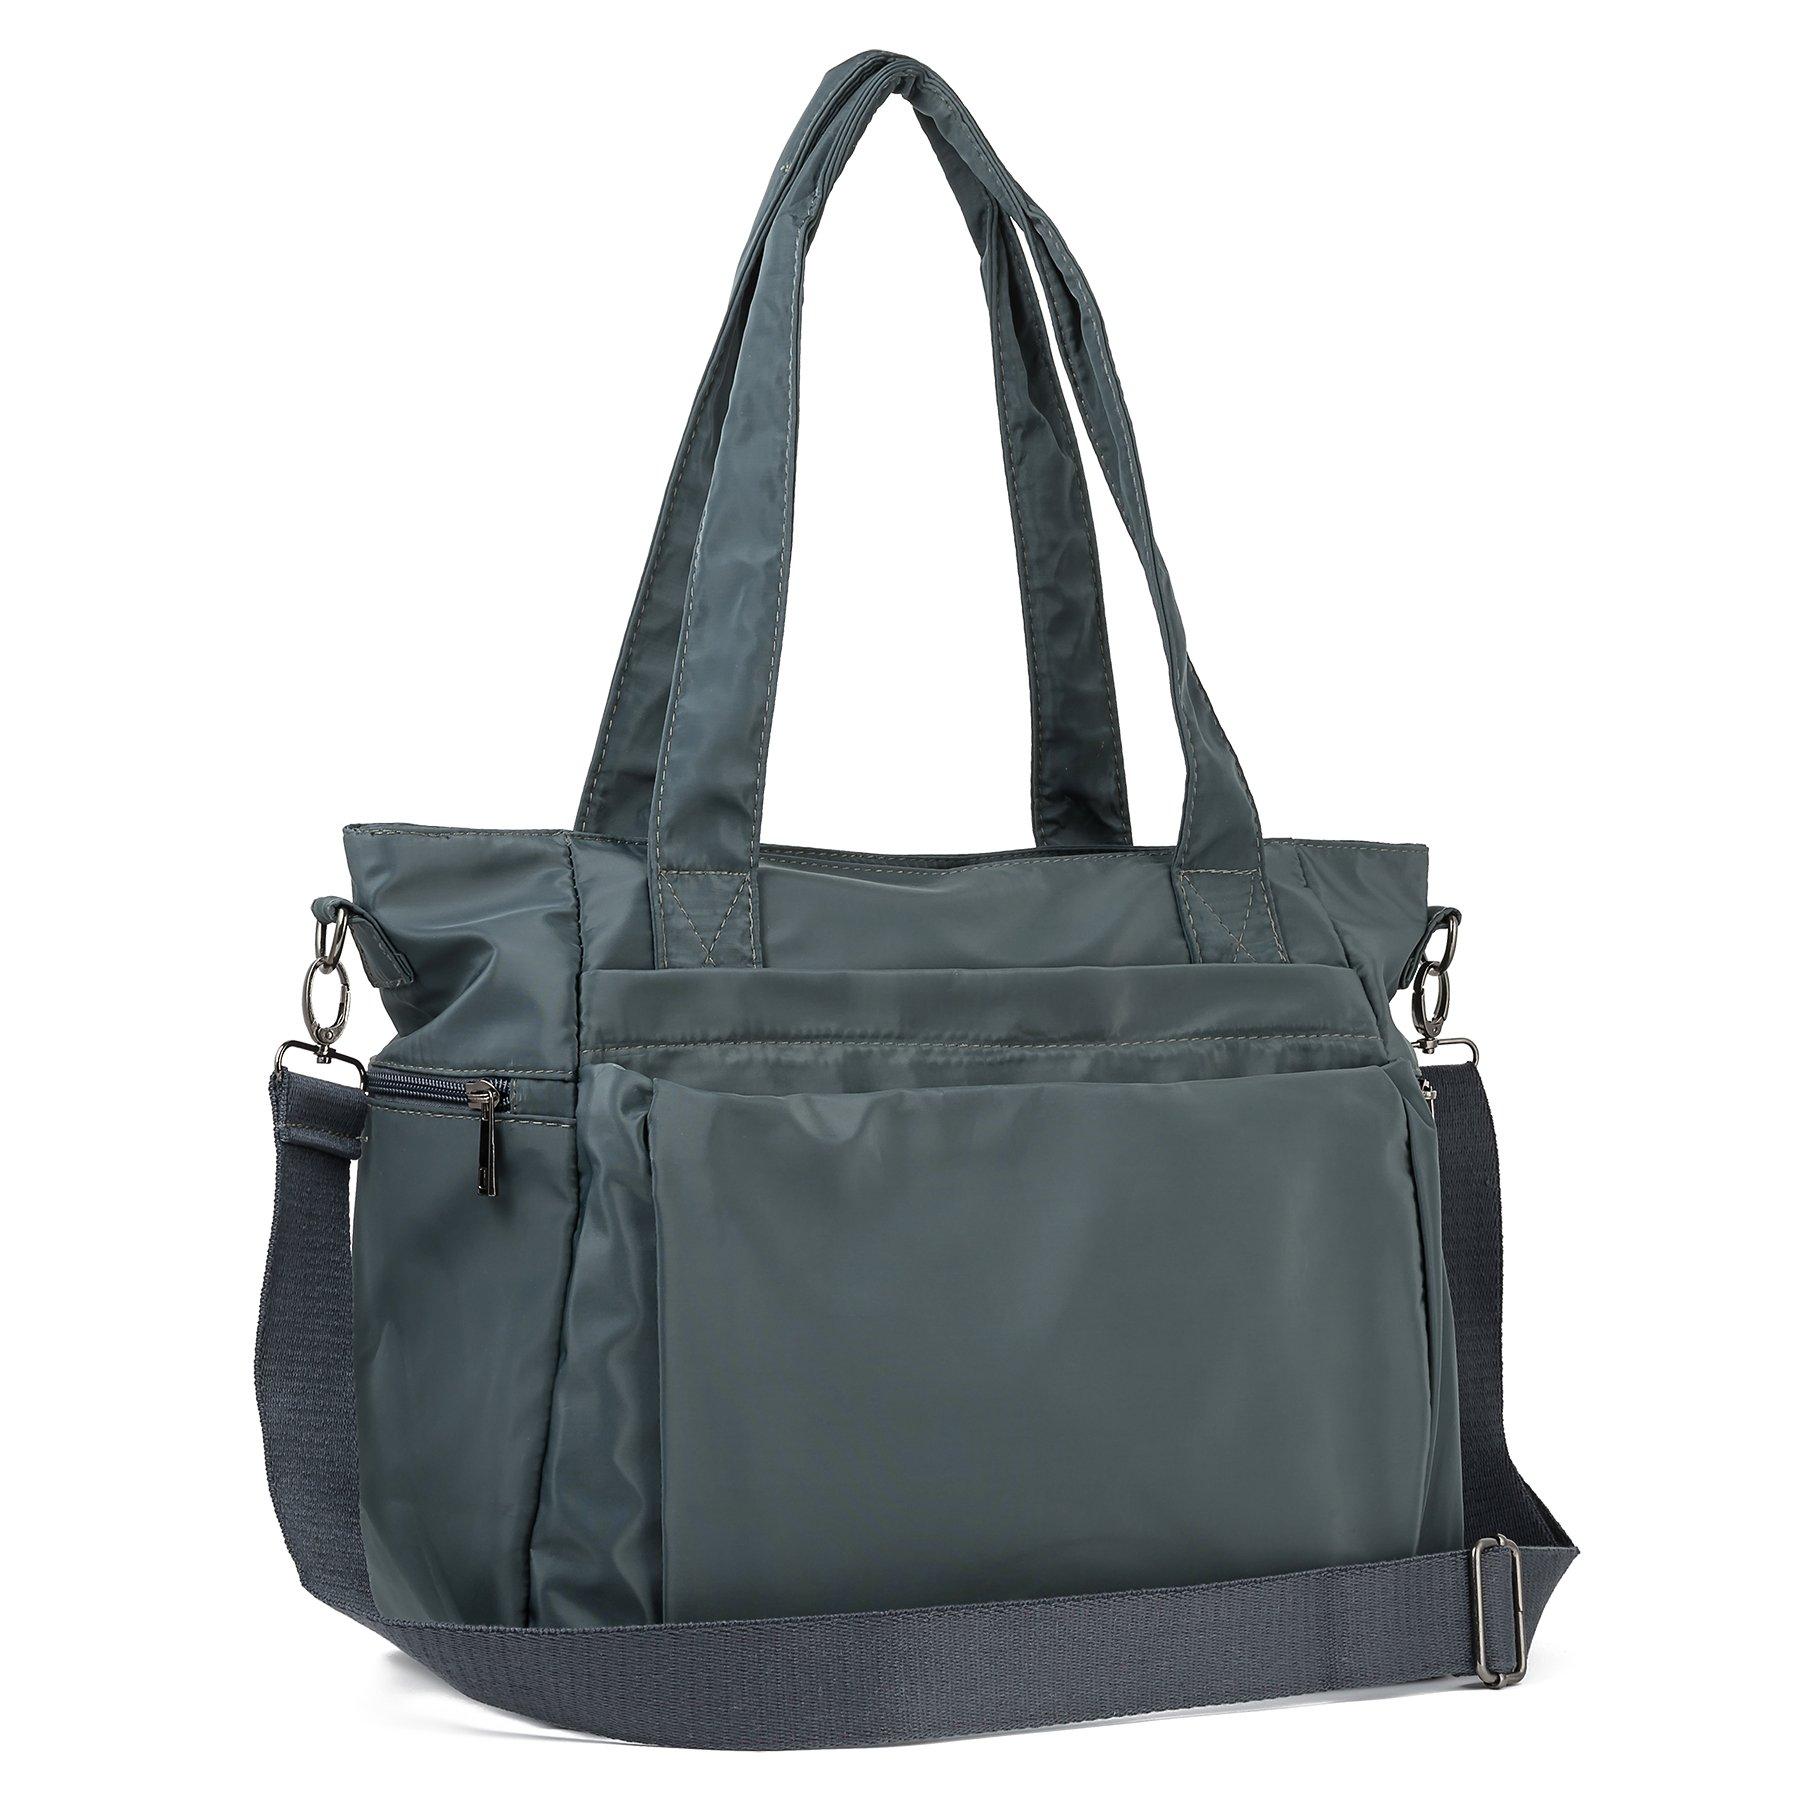 ZORESS Women Fashion Large Tote Shoulder Handbag Waterproof Multi-function Nylon Travel Messenger Bags (Grey)